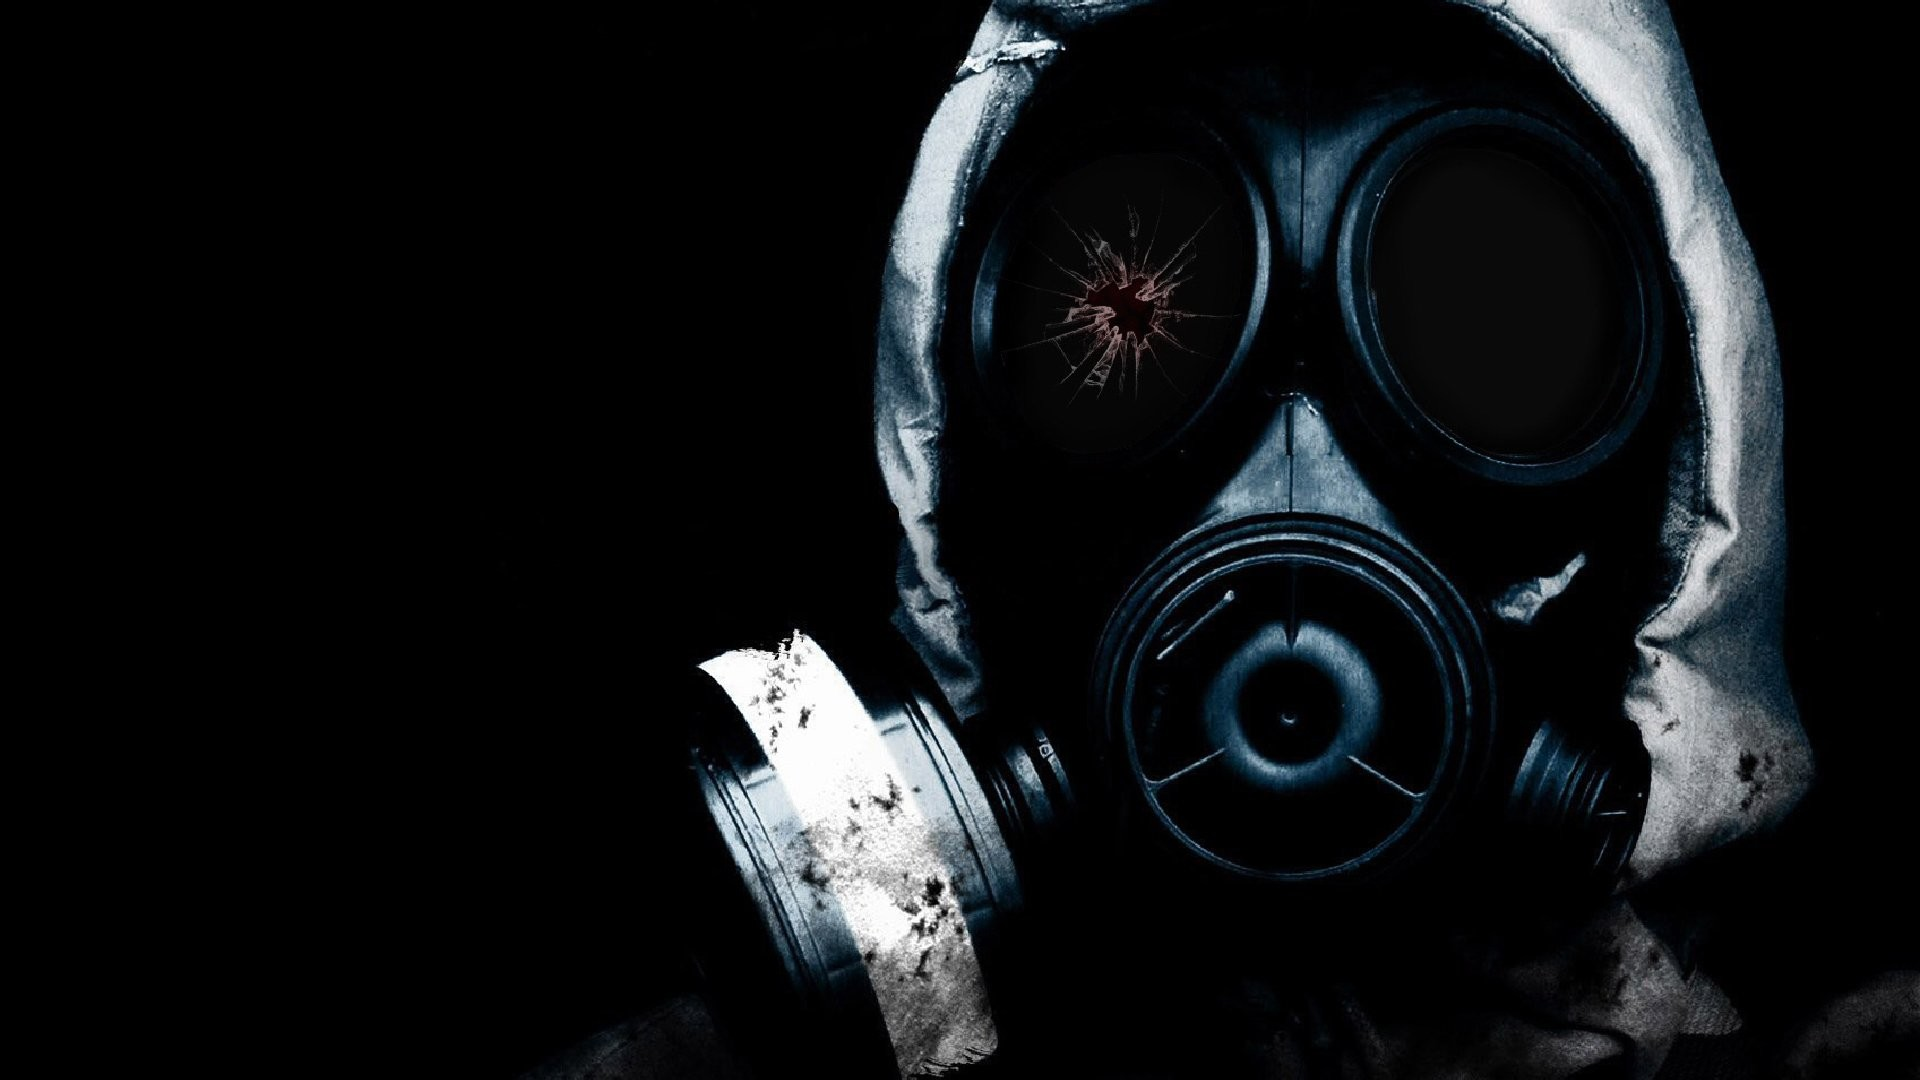 Dark – Creepy Mask Blood Anarchy Revolution Wallpaper